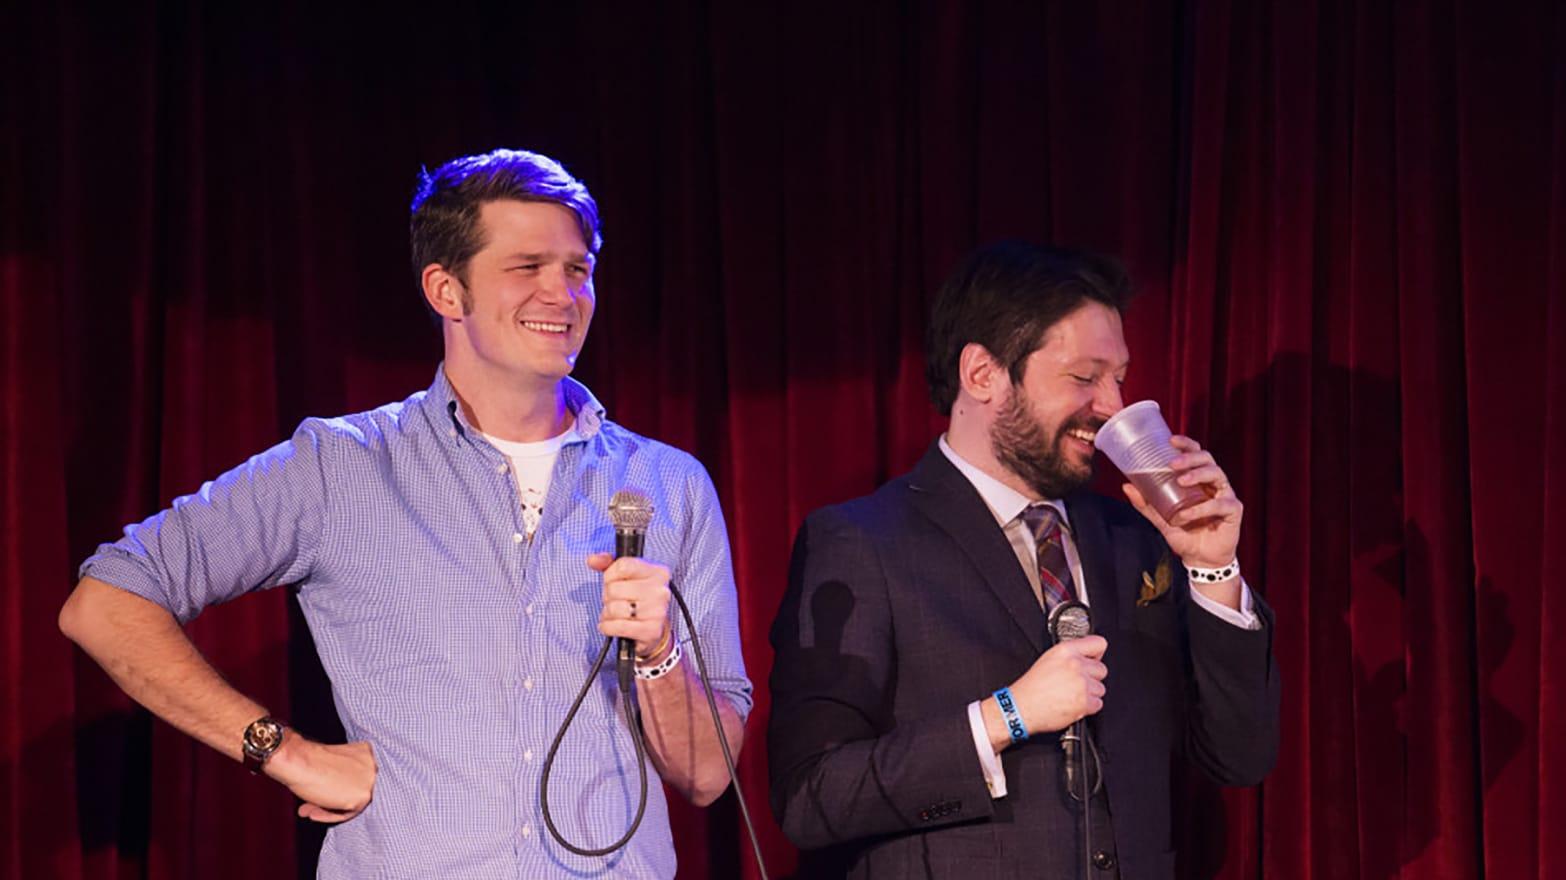 Meet the Buddies Behind 'Flop House,' the Internet's Funniest Film